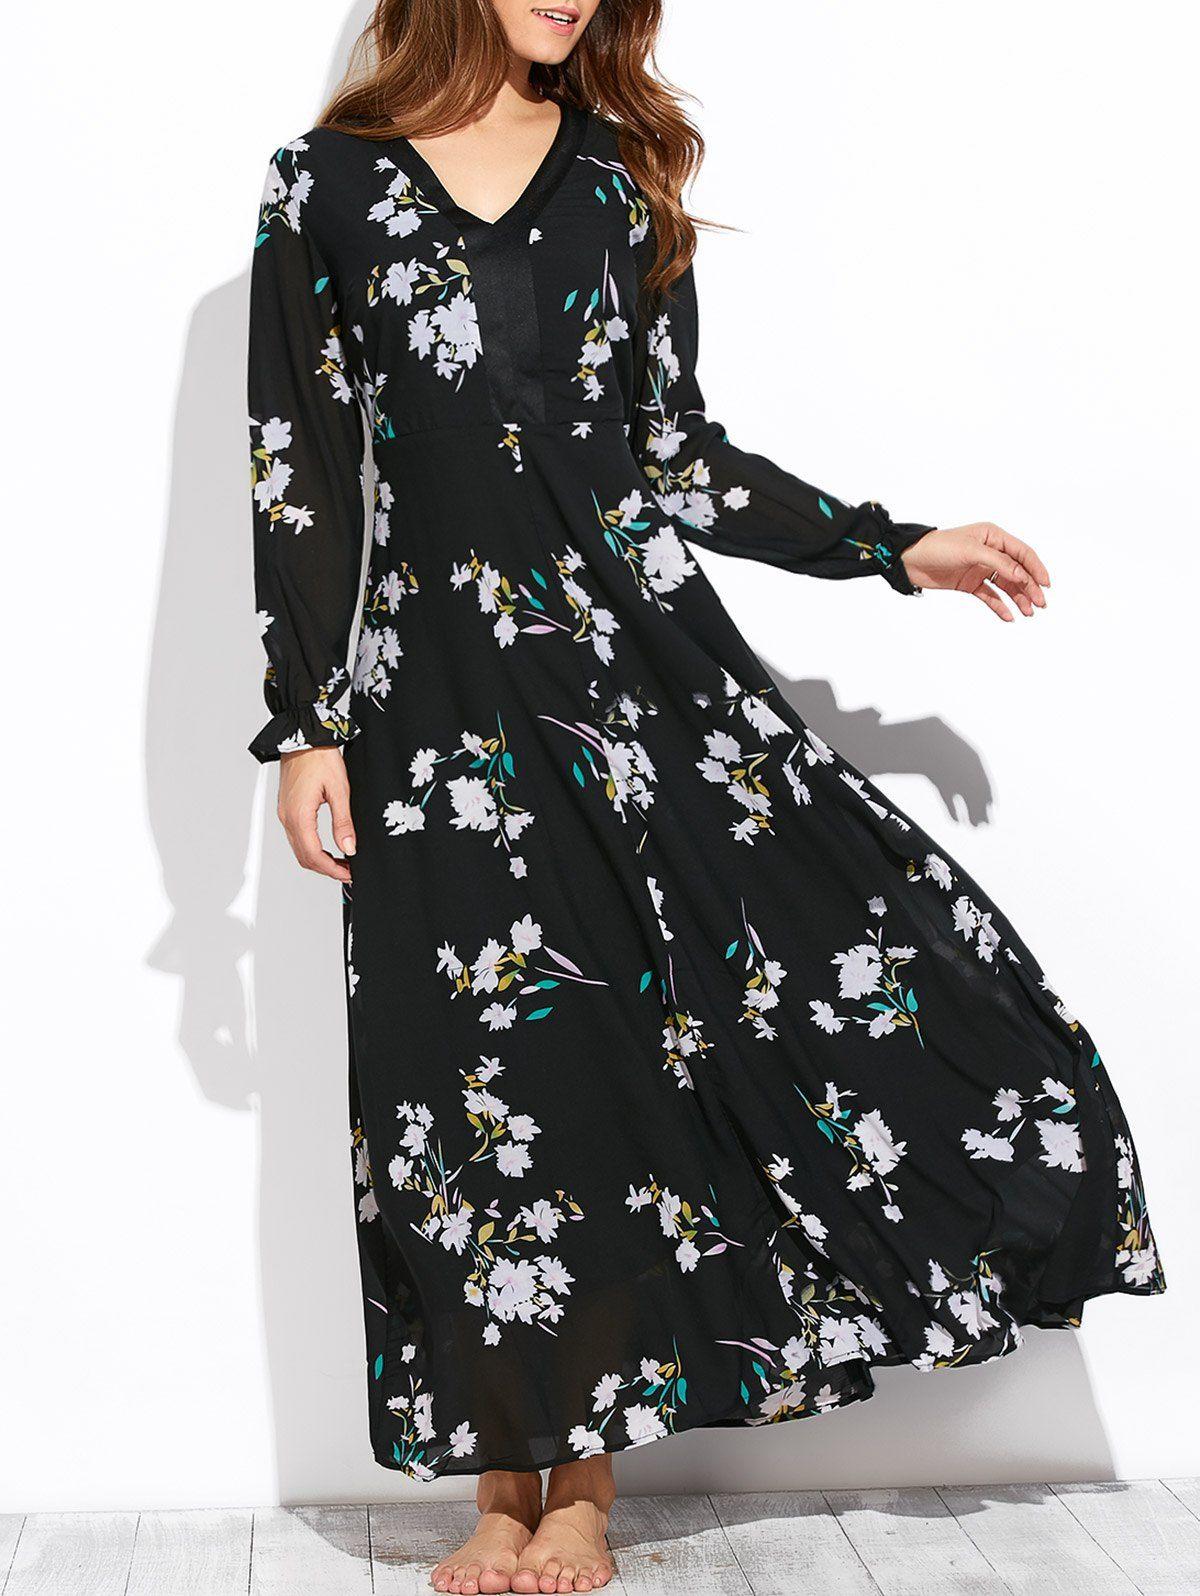 Flowy Printed Long Sleeve Maxi Dress White Maxi Dresses Online Floral Print Maxi Dress Fashion Clothes Women [ 1596 x 1200 Pixel ]